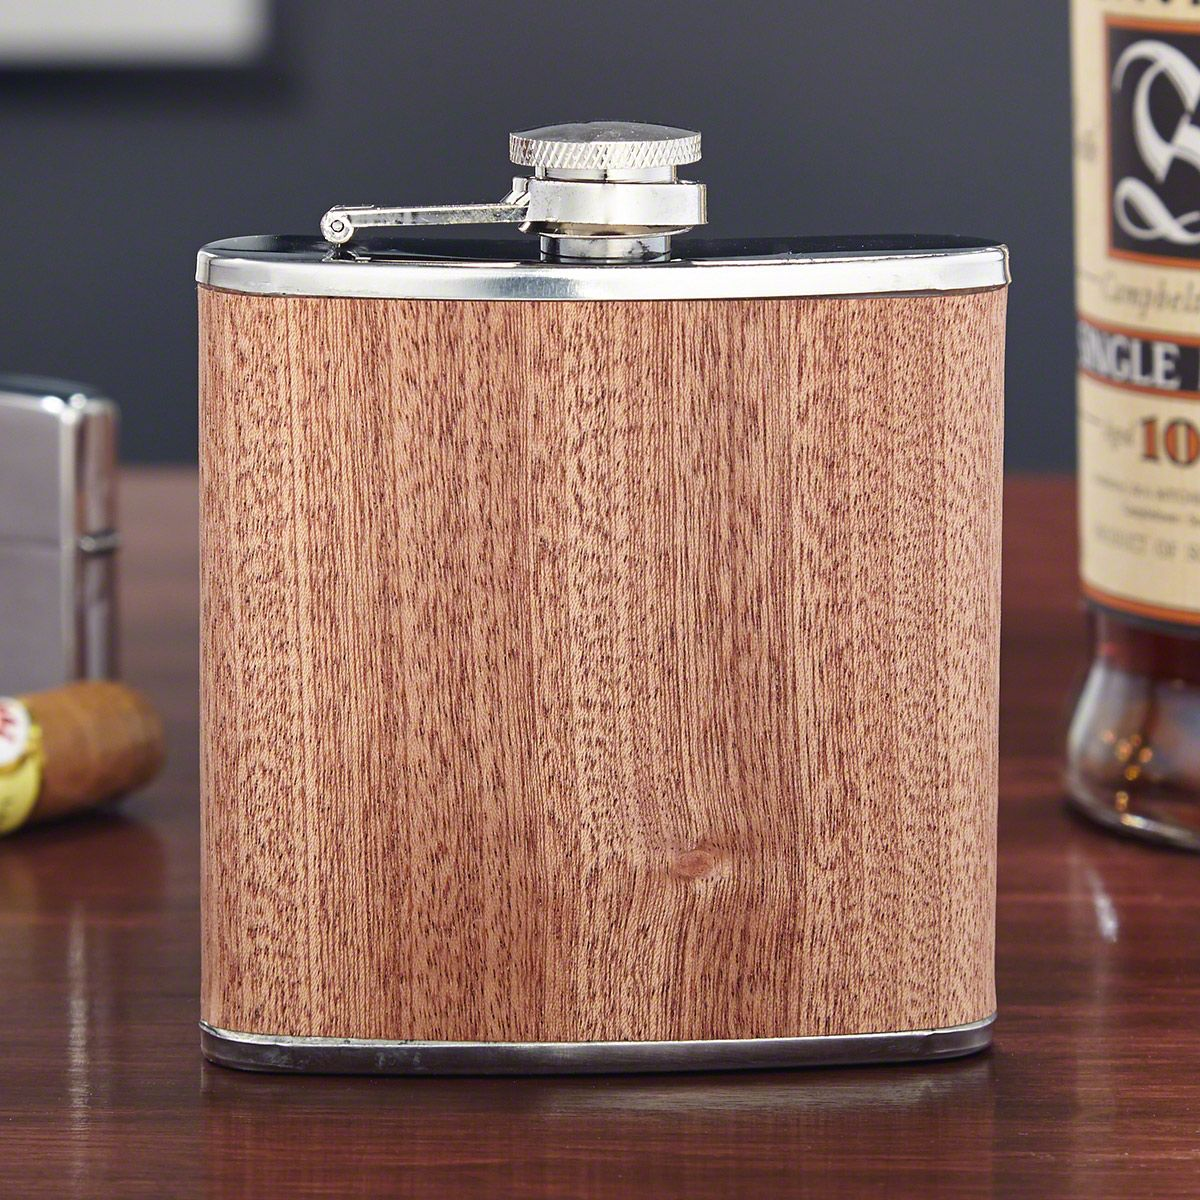 Walden Wood Liquor Flask